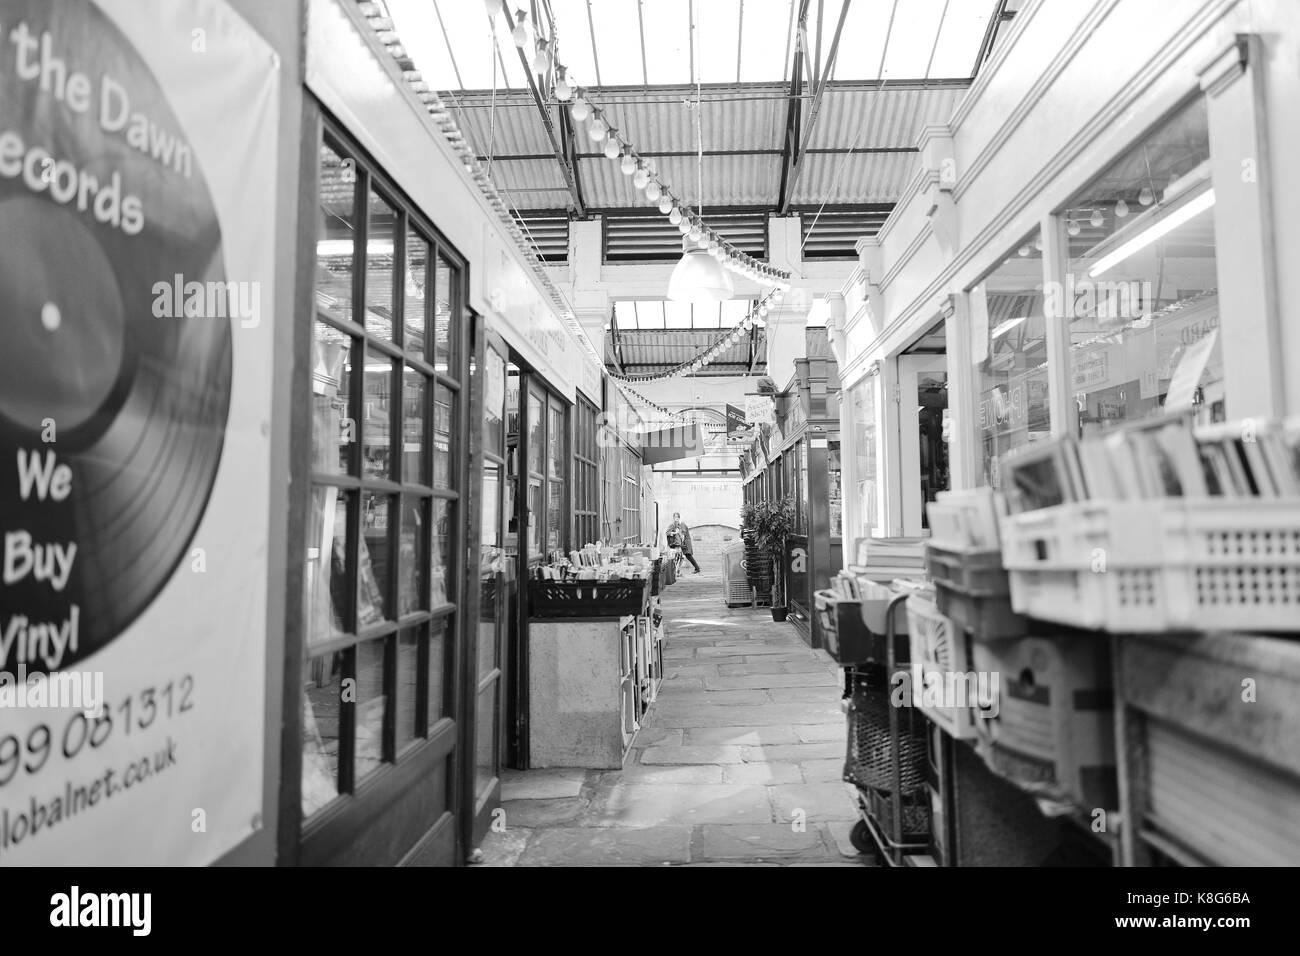 St Nicholas Market Bristol - Stock Image